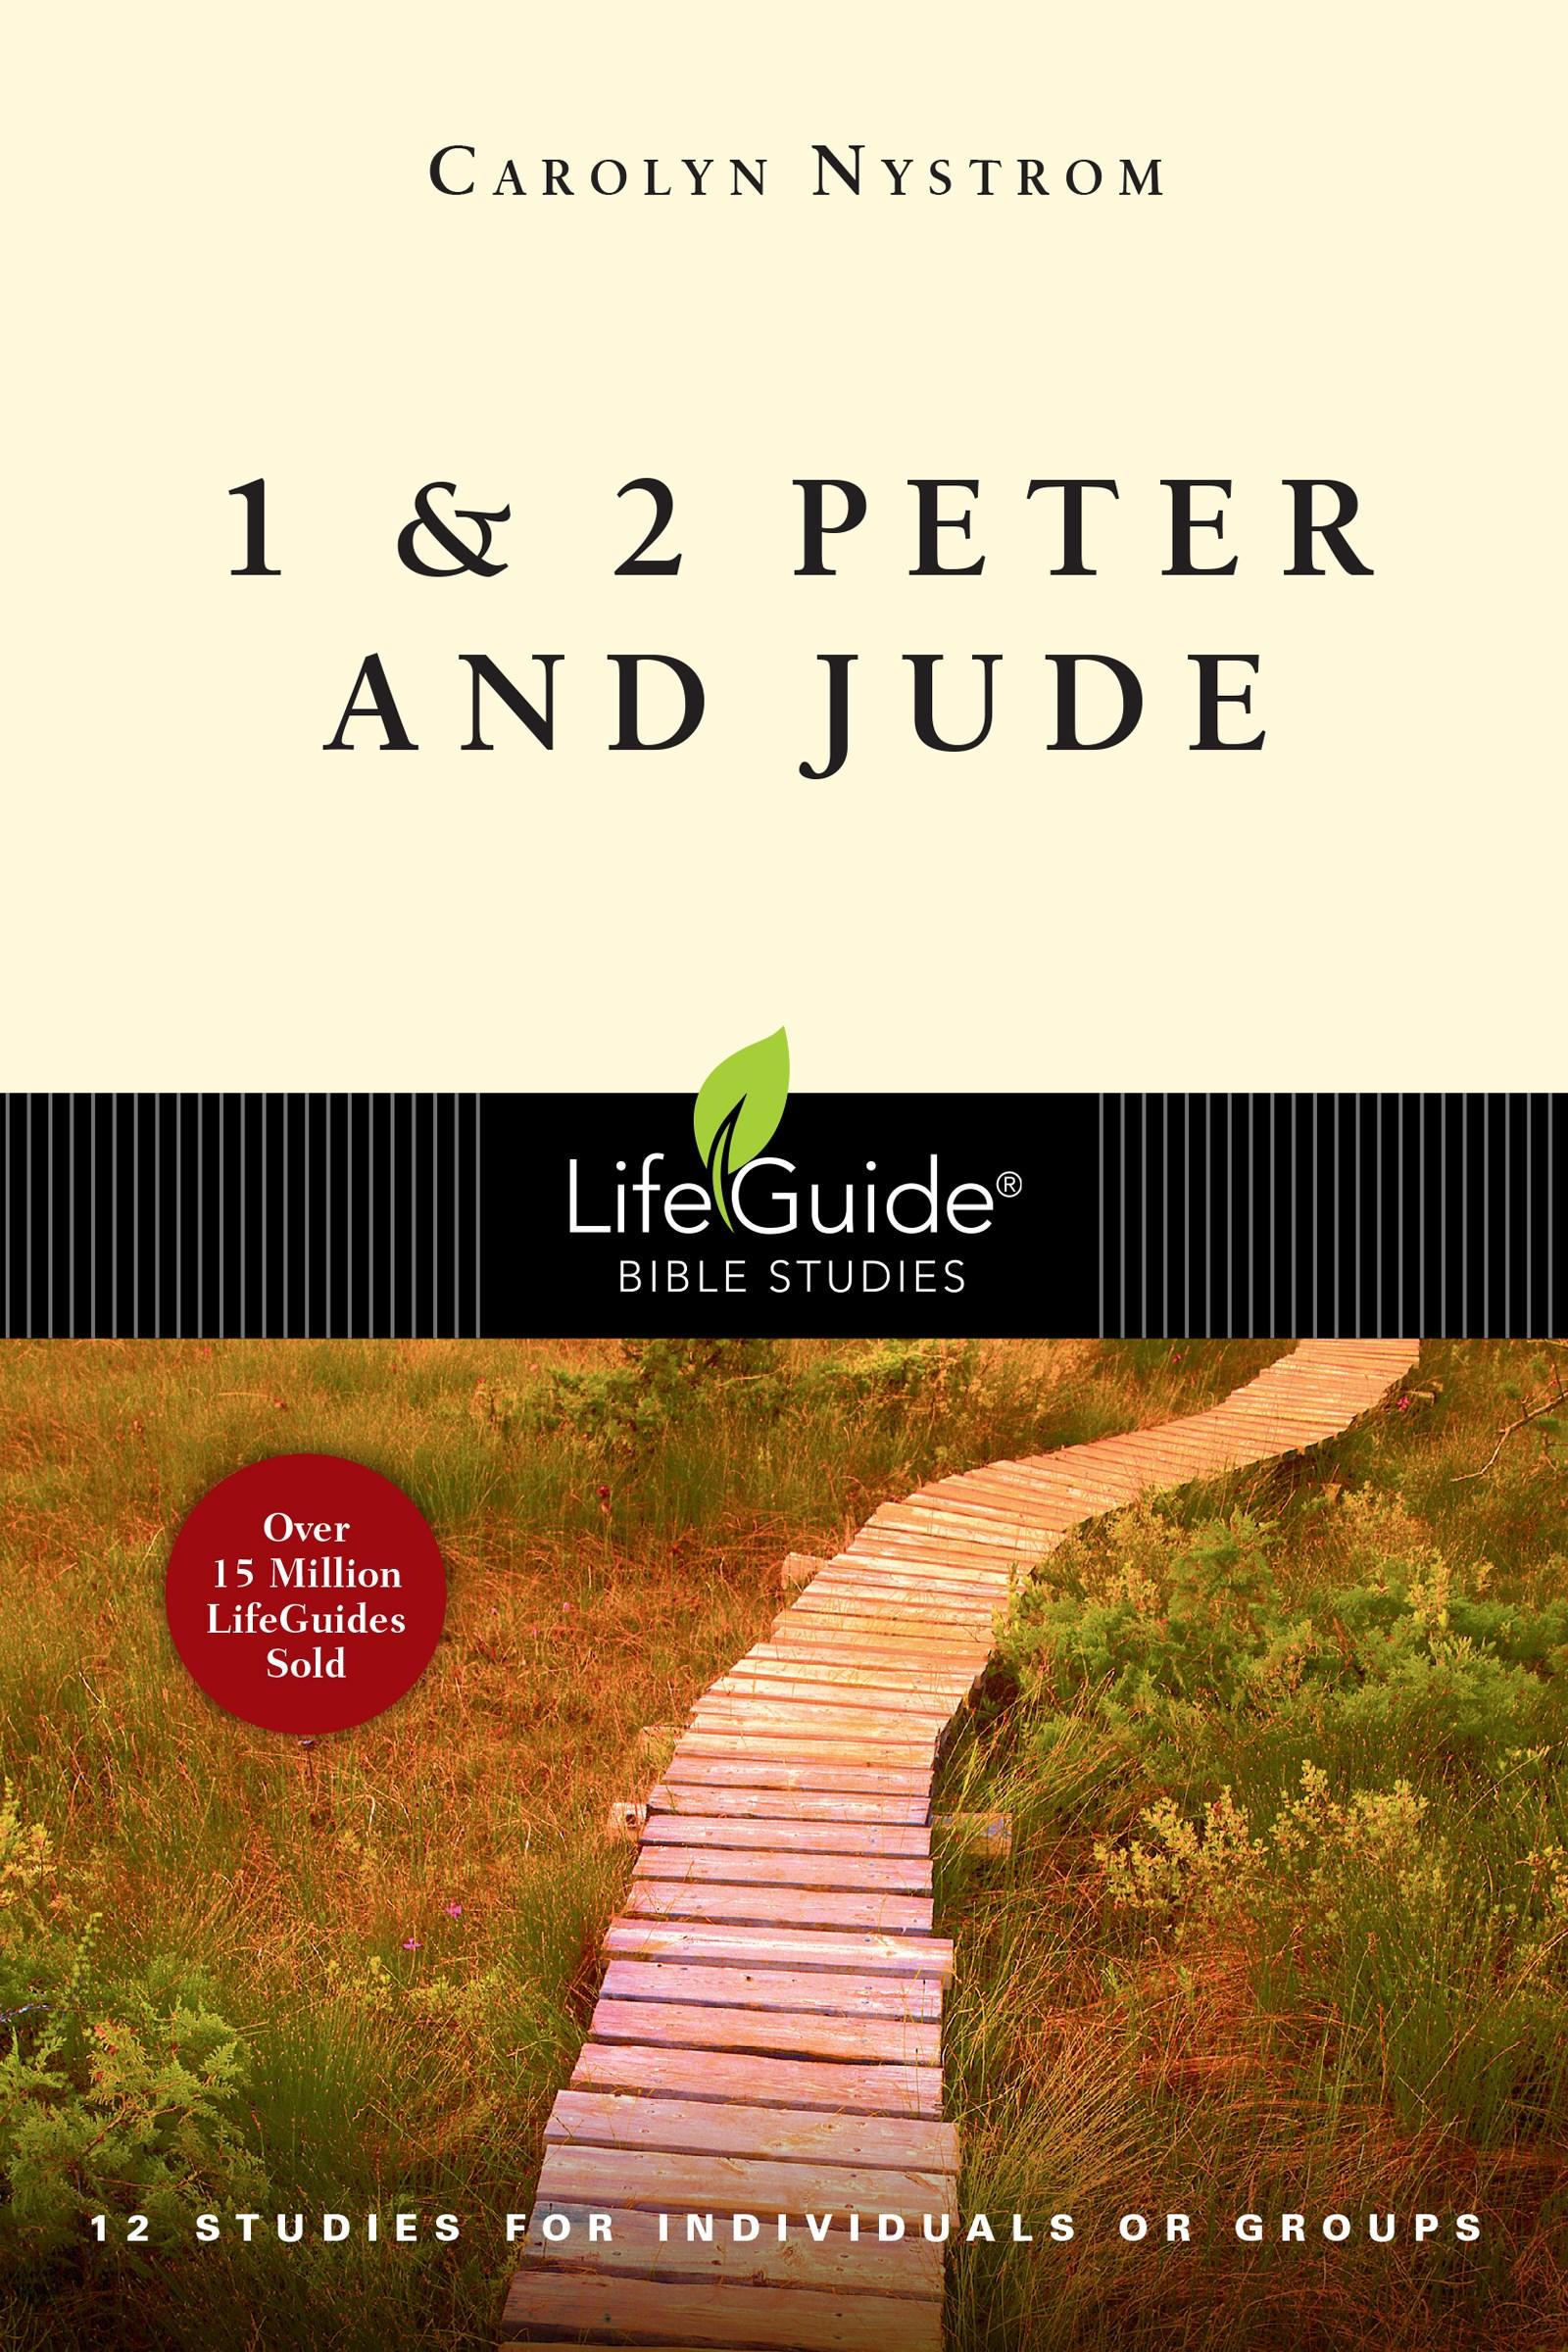 1 & 2 Peter And Jude (LifeGuide Bible Study)